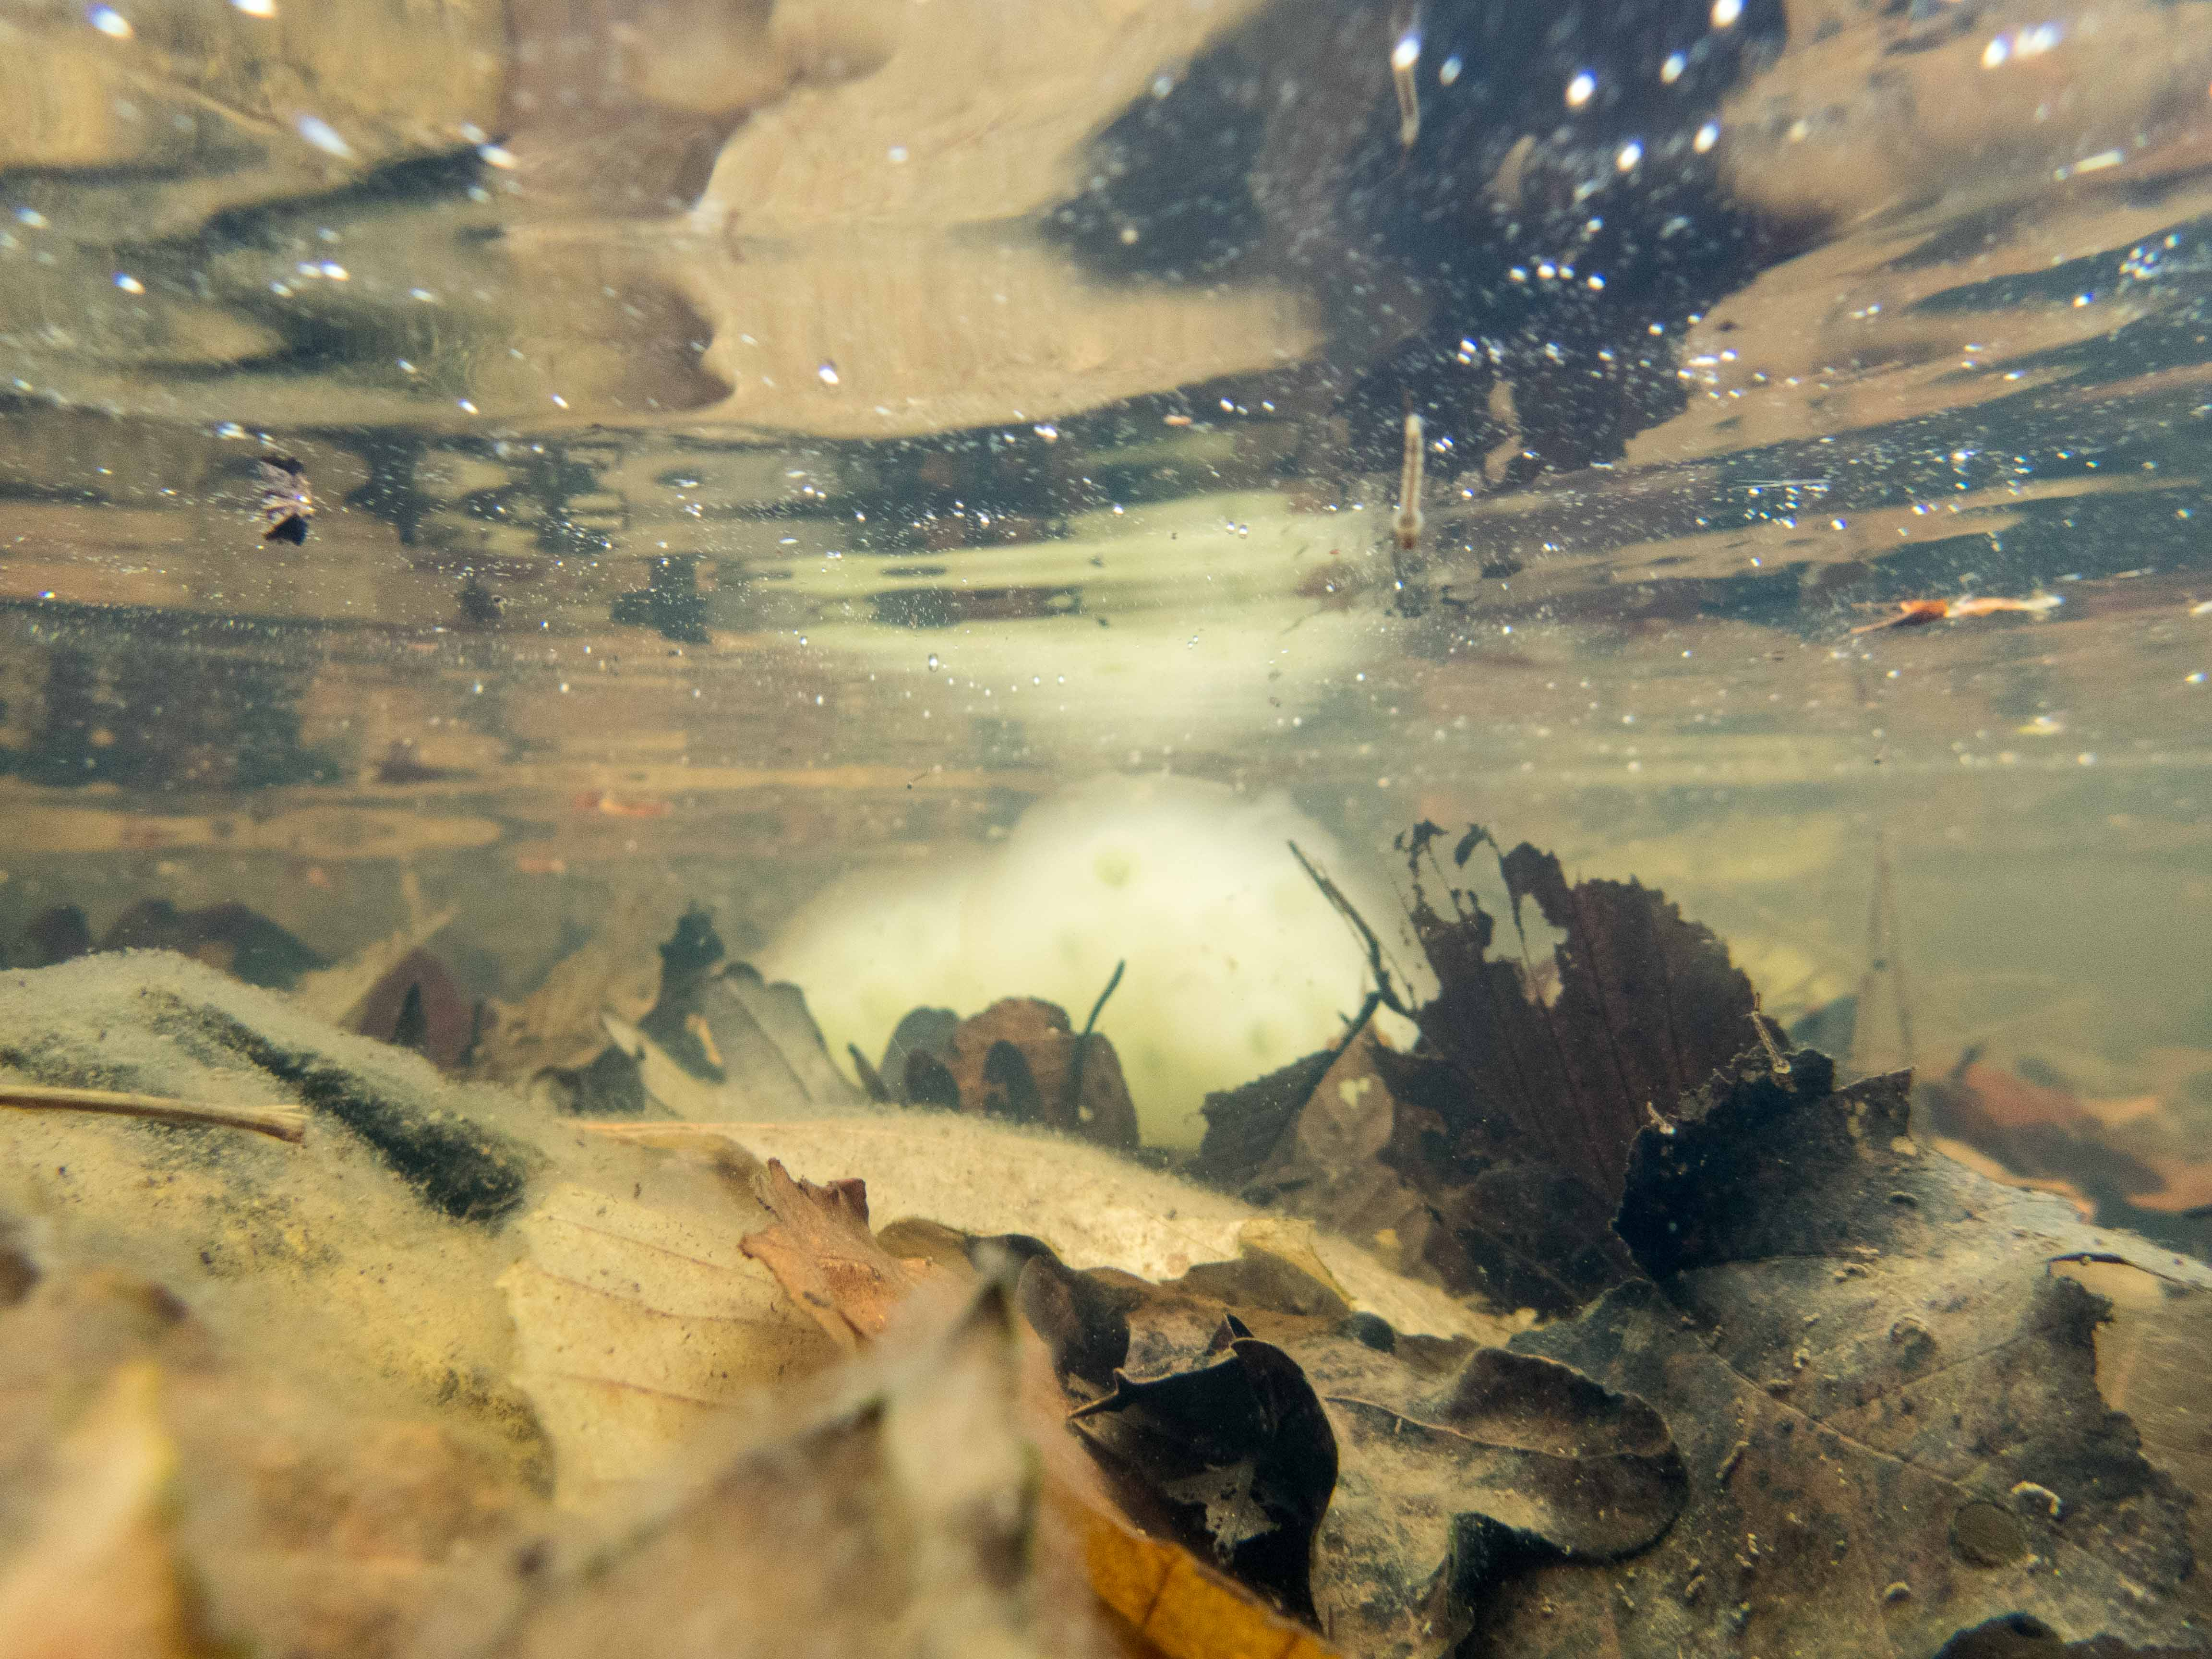 tTR/NAFTRG Wood Turtle Monitoring, April 22-24, 2016